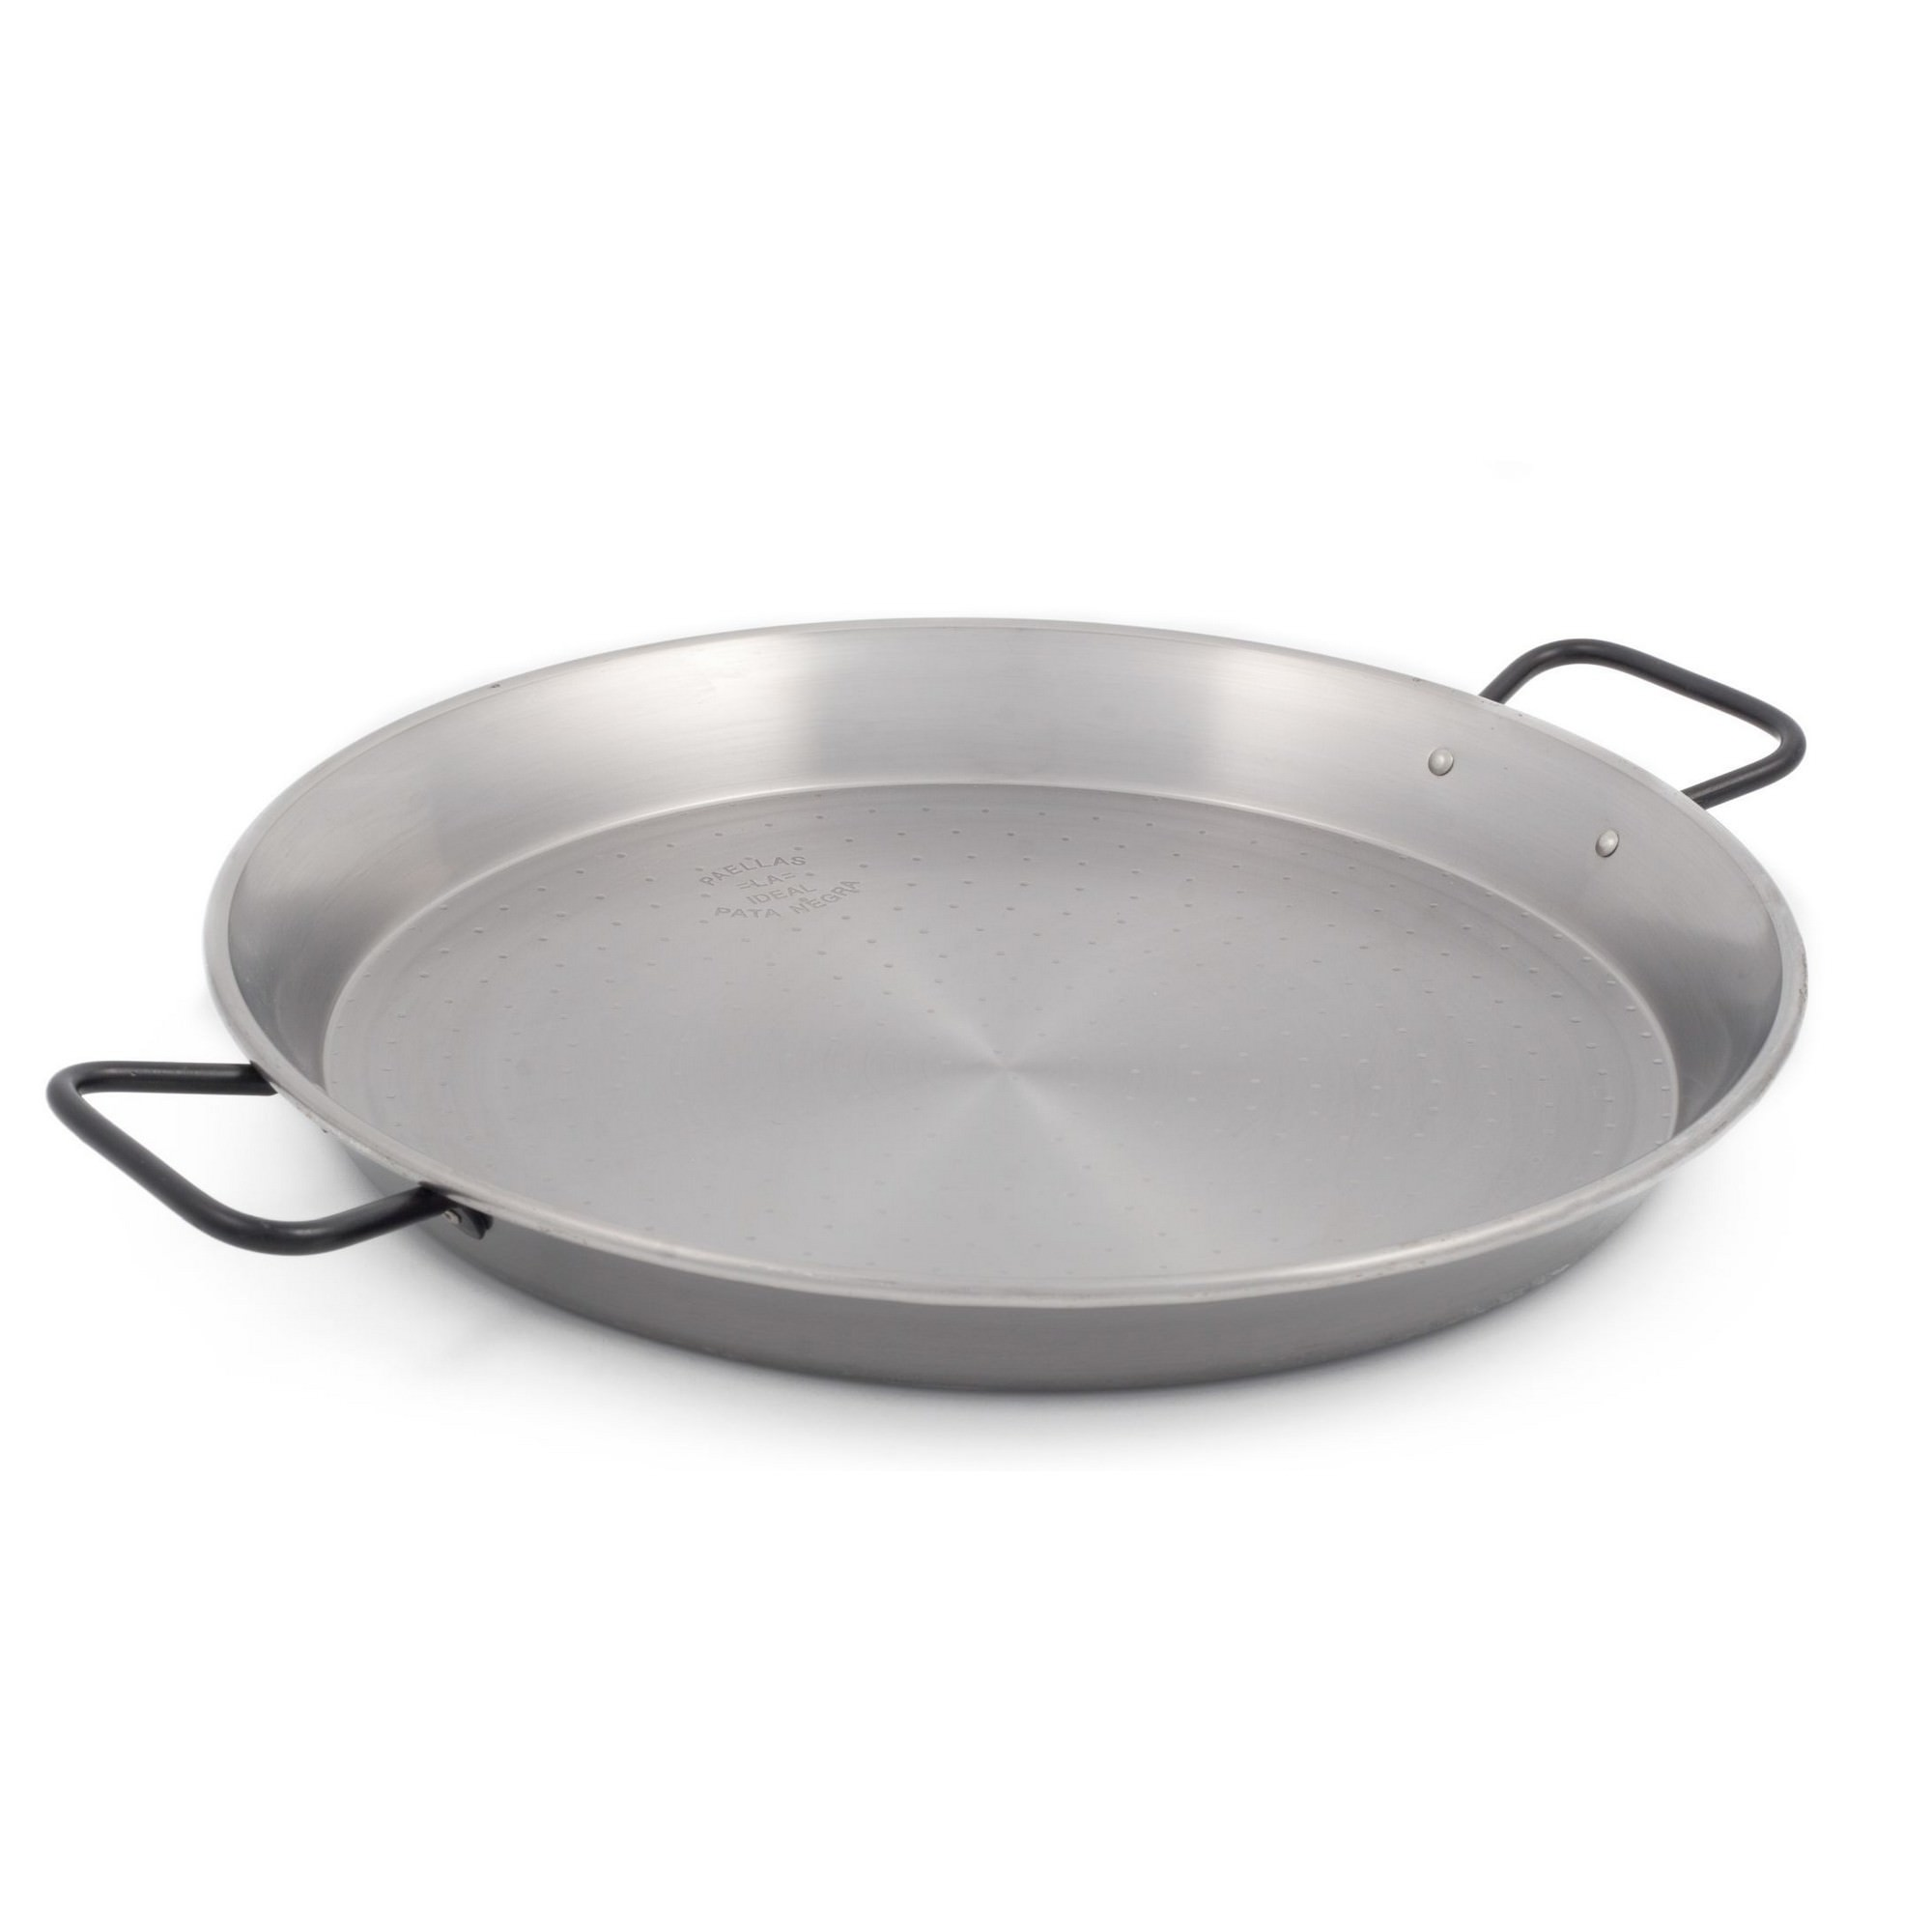 Garcima Pata Negra Professional Paella Pan, 40cm